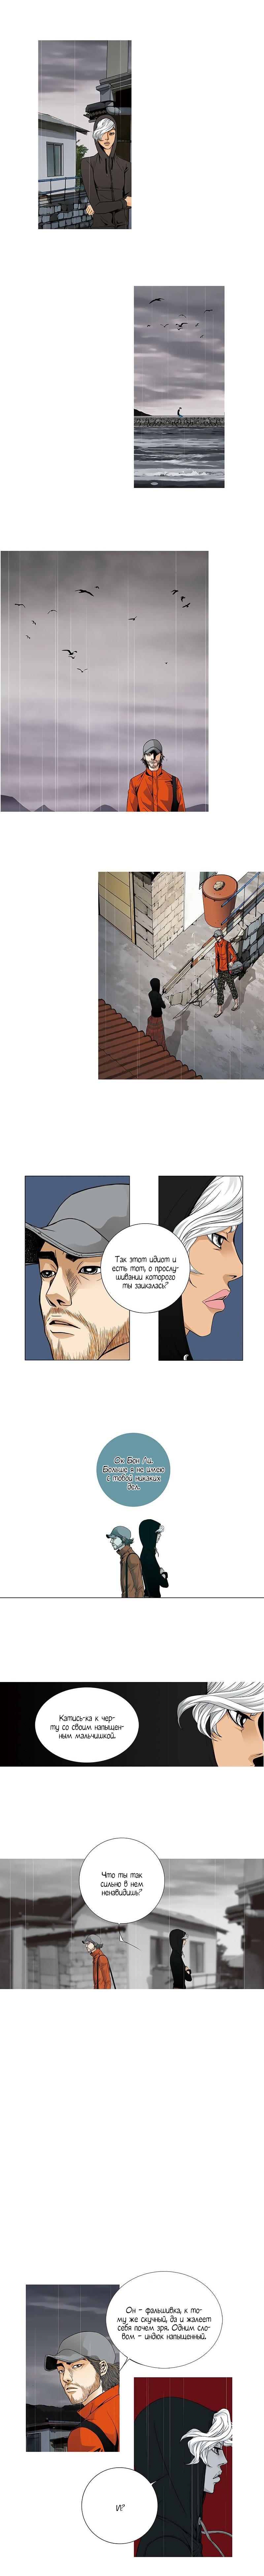 https://r1.ninemanga.com/comics/pic2/29/28573/344320/1512078304478.jpg Page 4